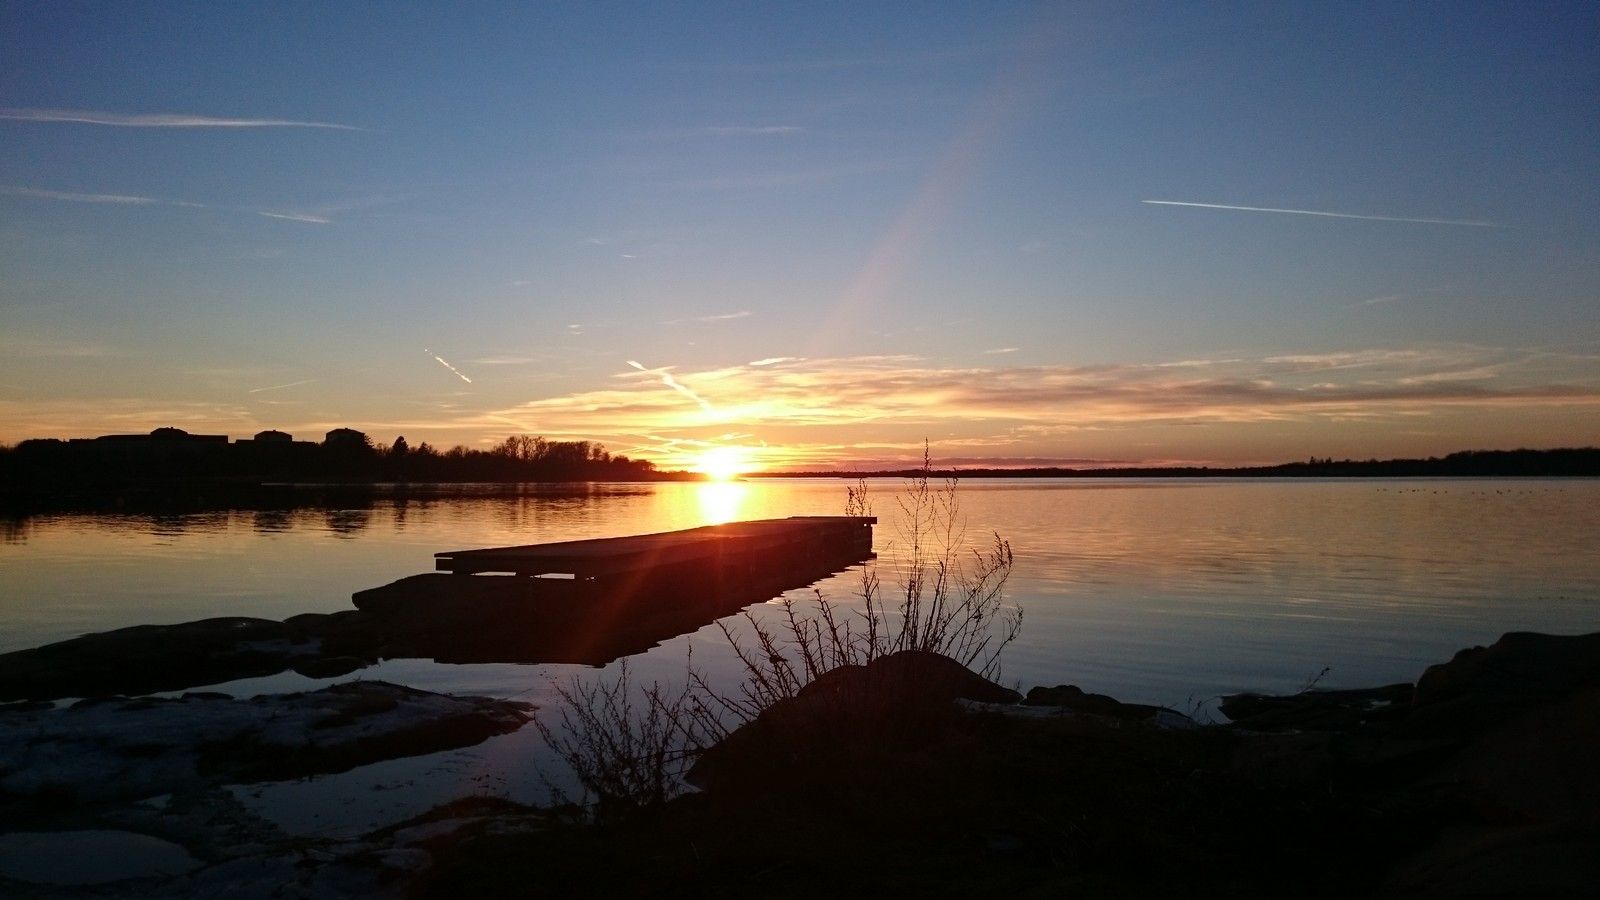 Bidrag 4 - Solnedgång vid stranden